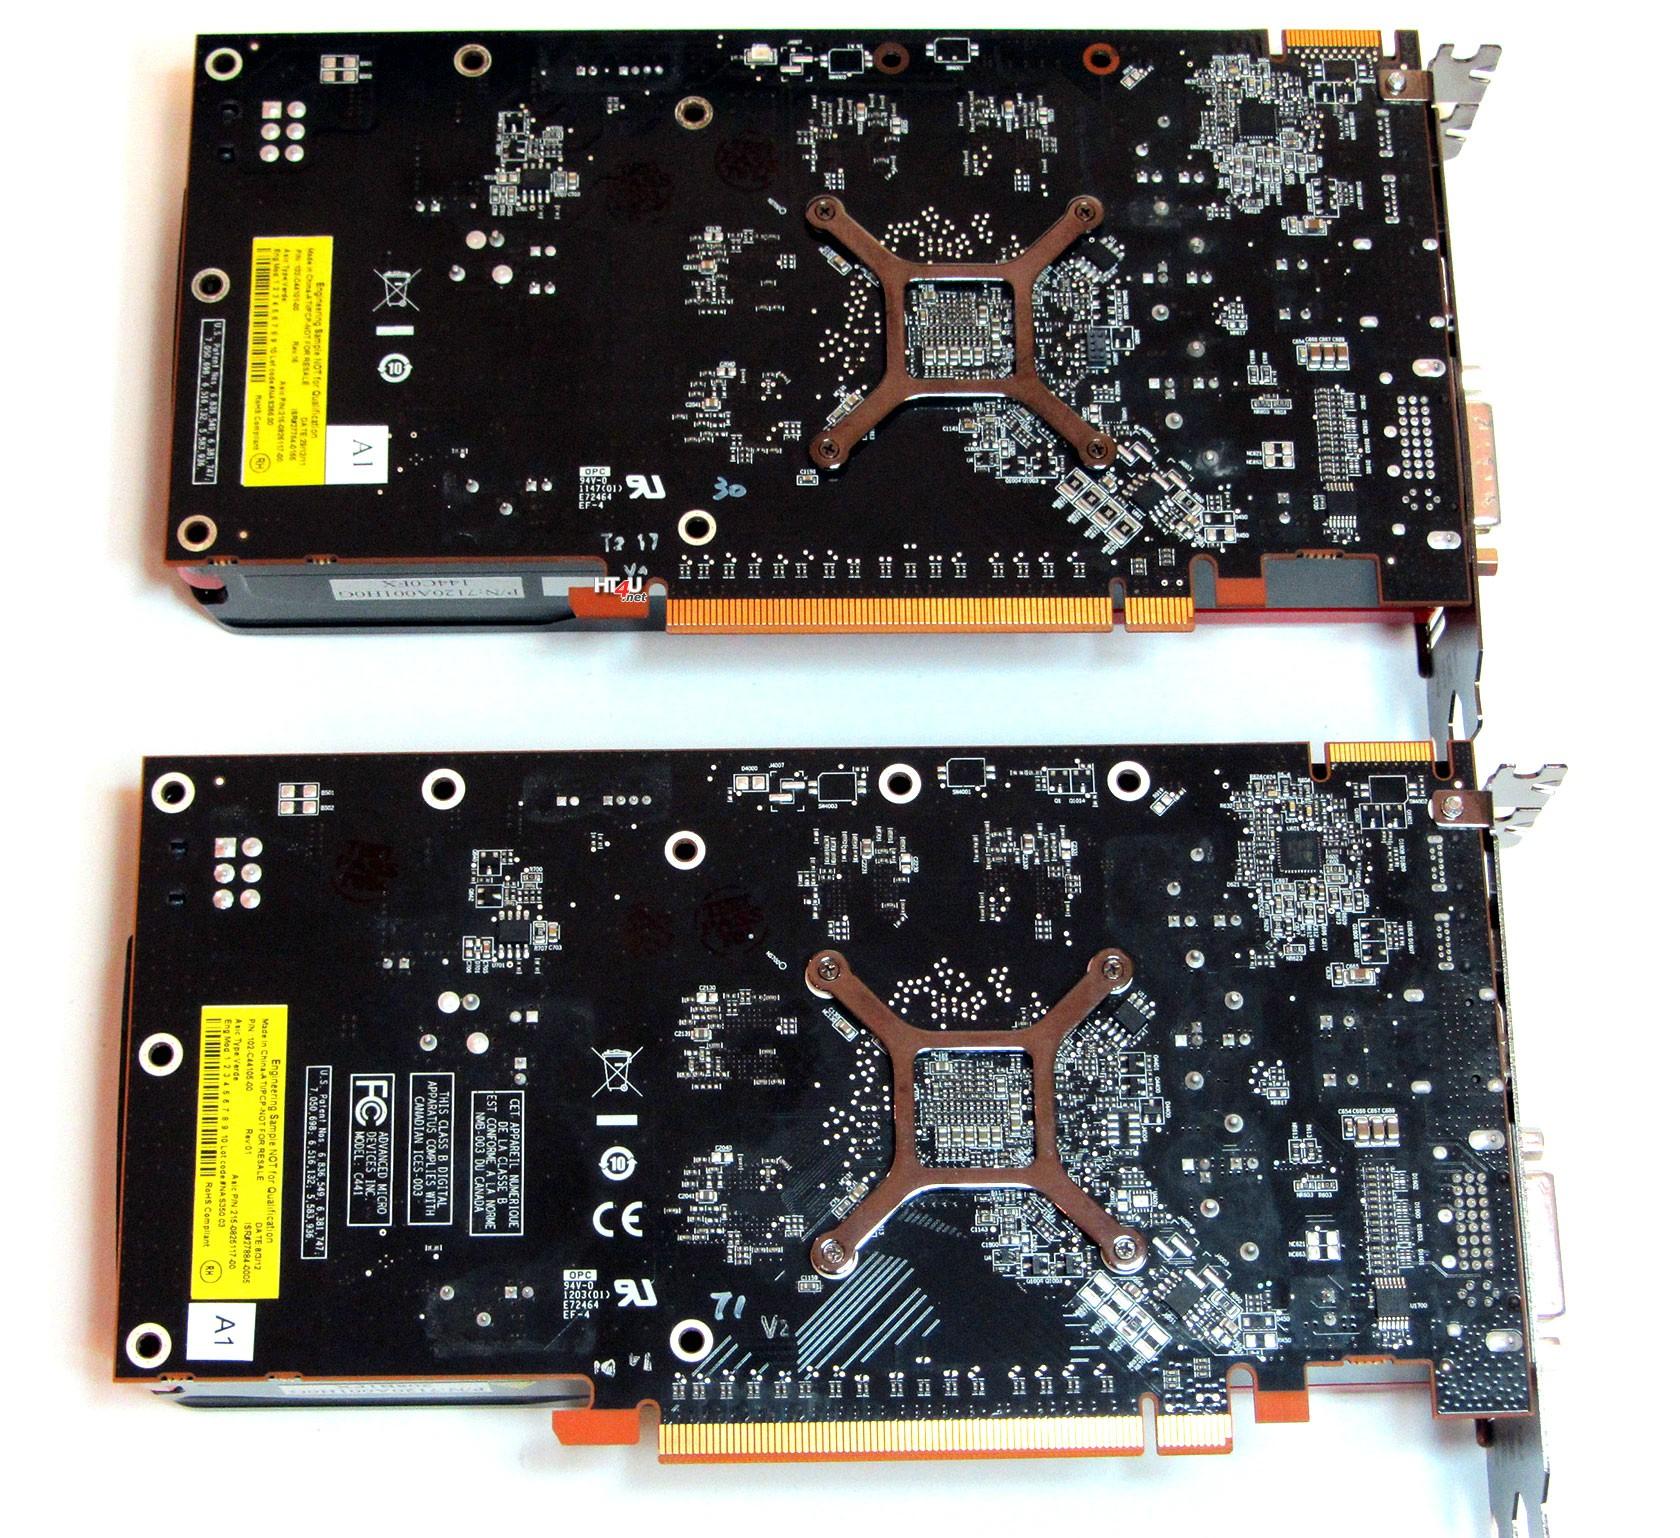 AMD Radeon HD 7750 900 MHz Edition vs AMD Radeon HD 7770